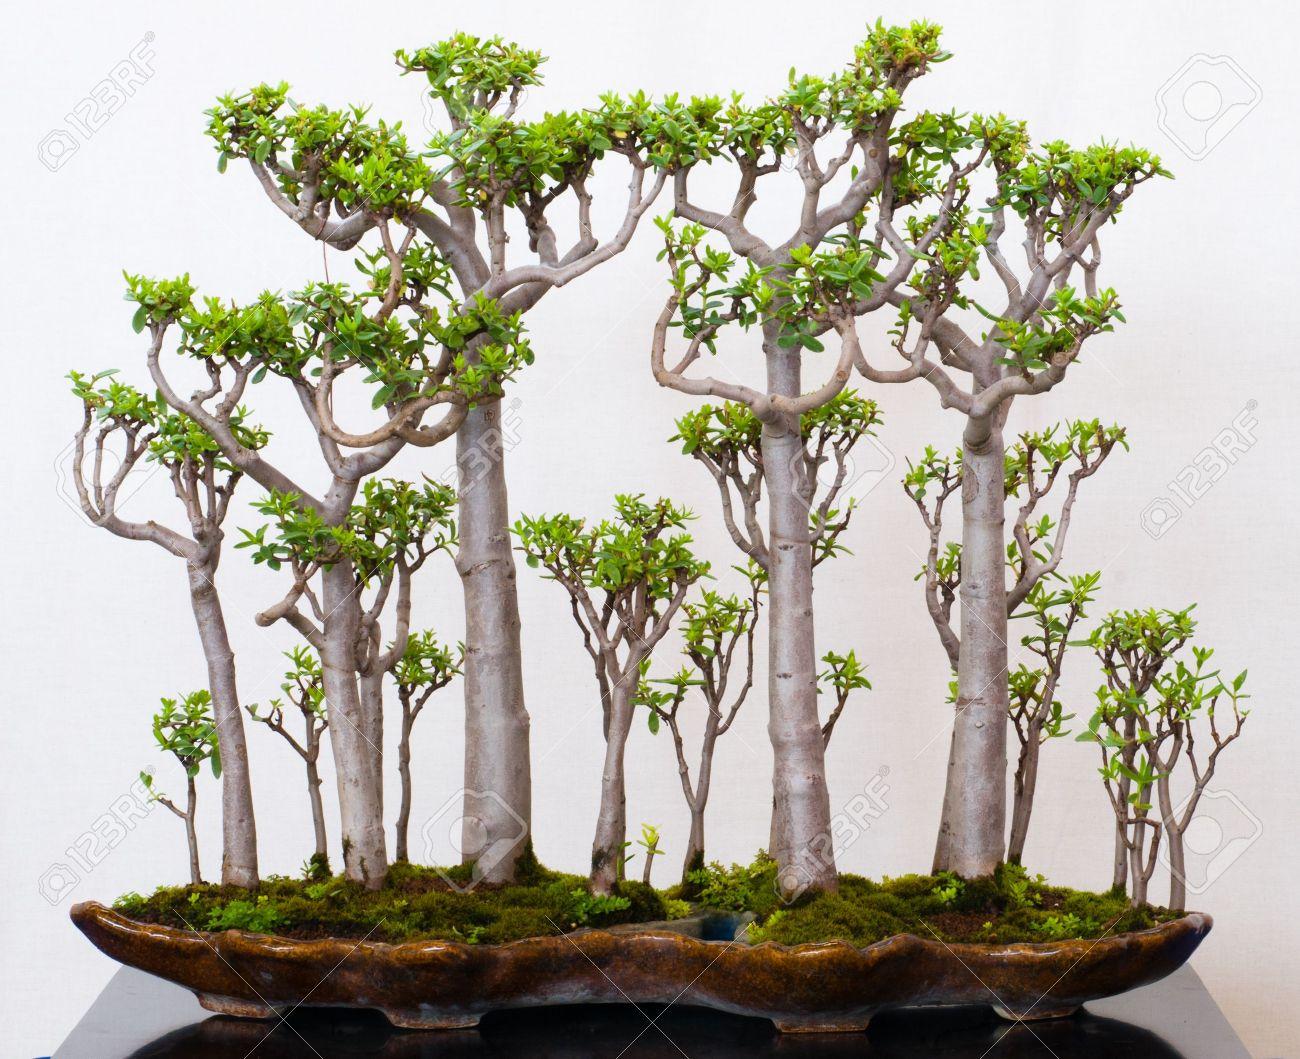 Crassula sarcocaulis as bonsai forest in a pot - 8018779